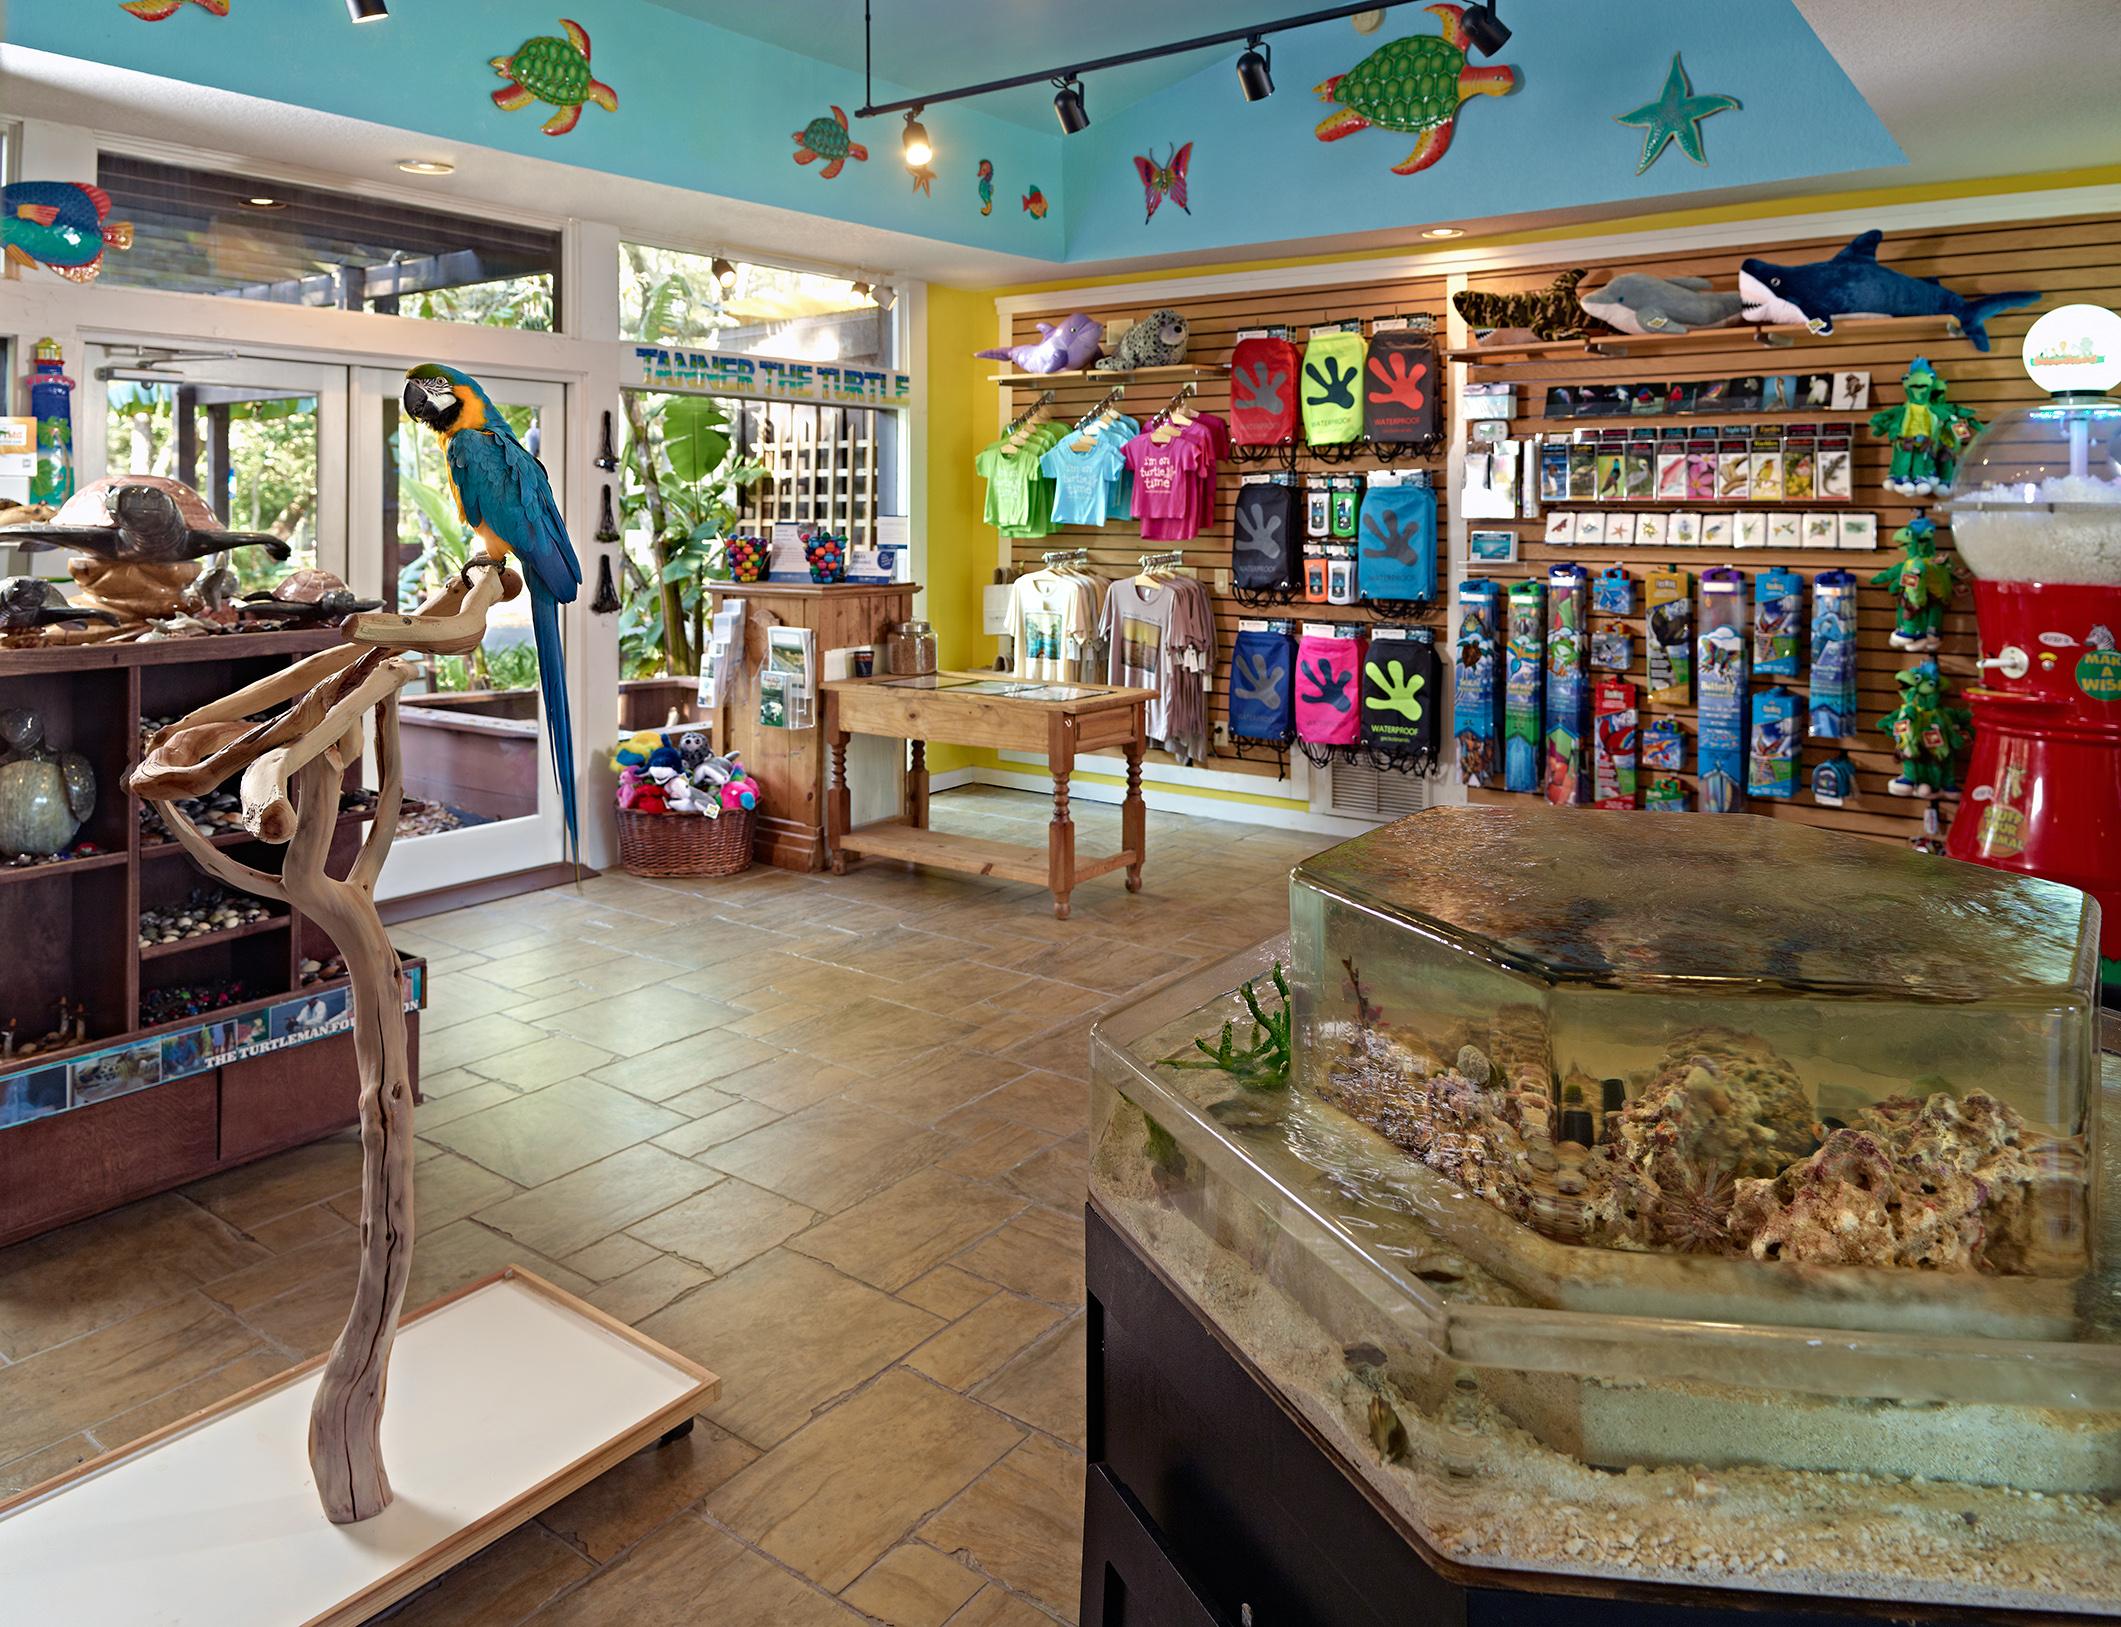 Omni Amelia Island Plantation Resort image 5